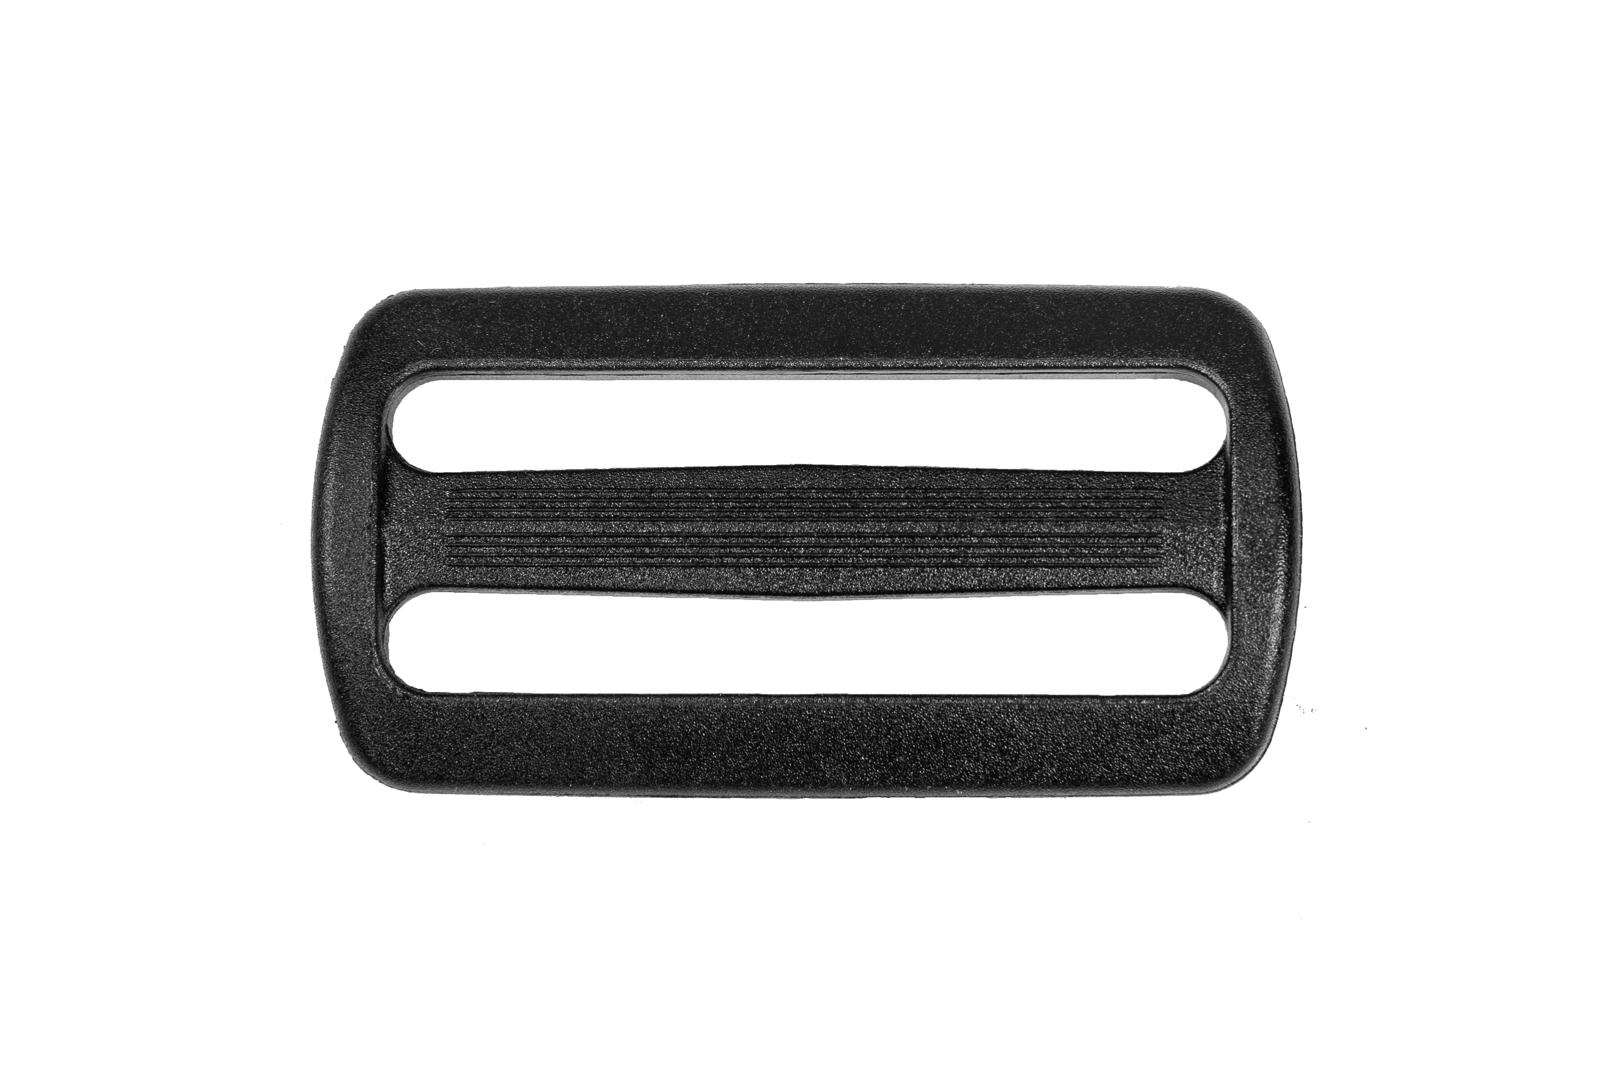 Trekking belt slip-lock